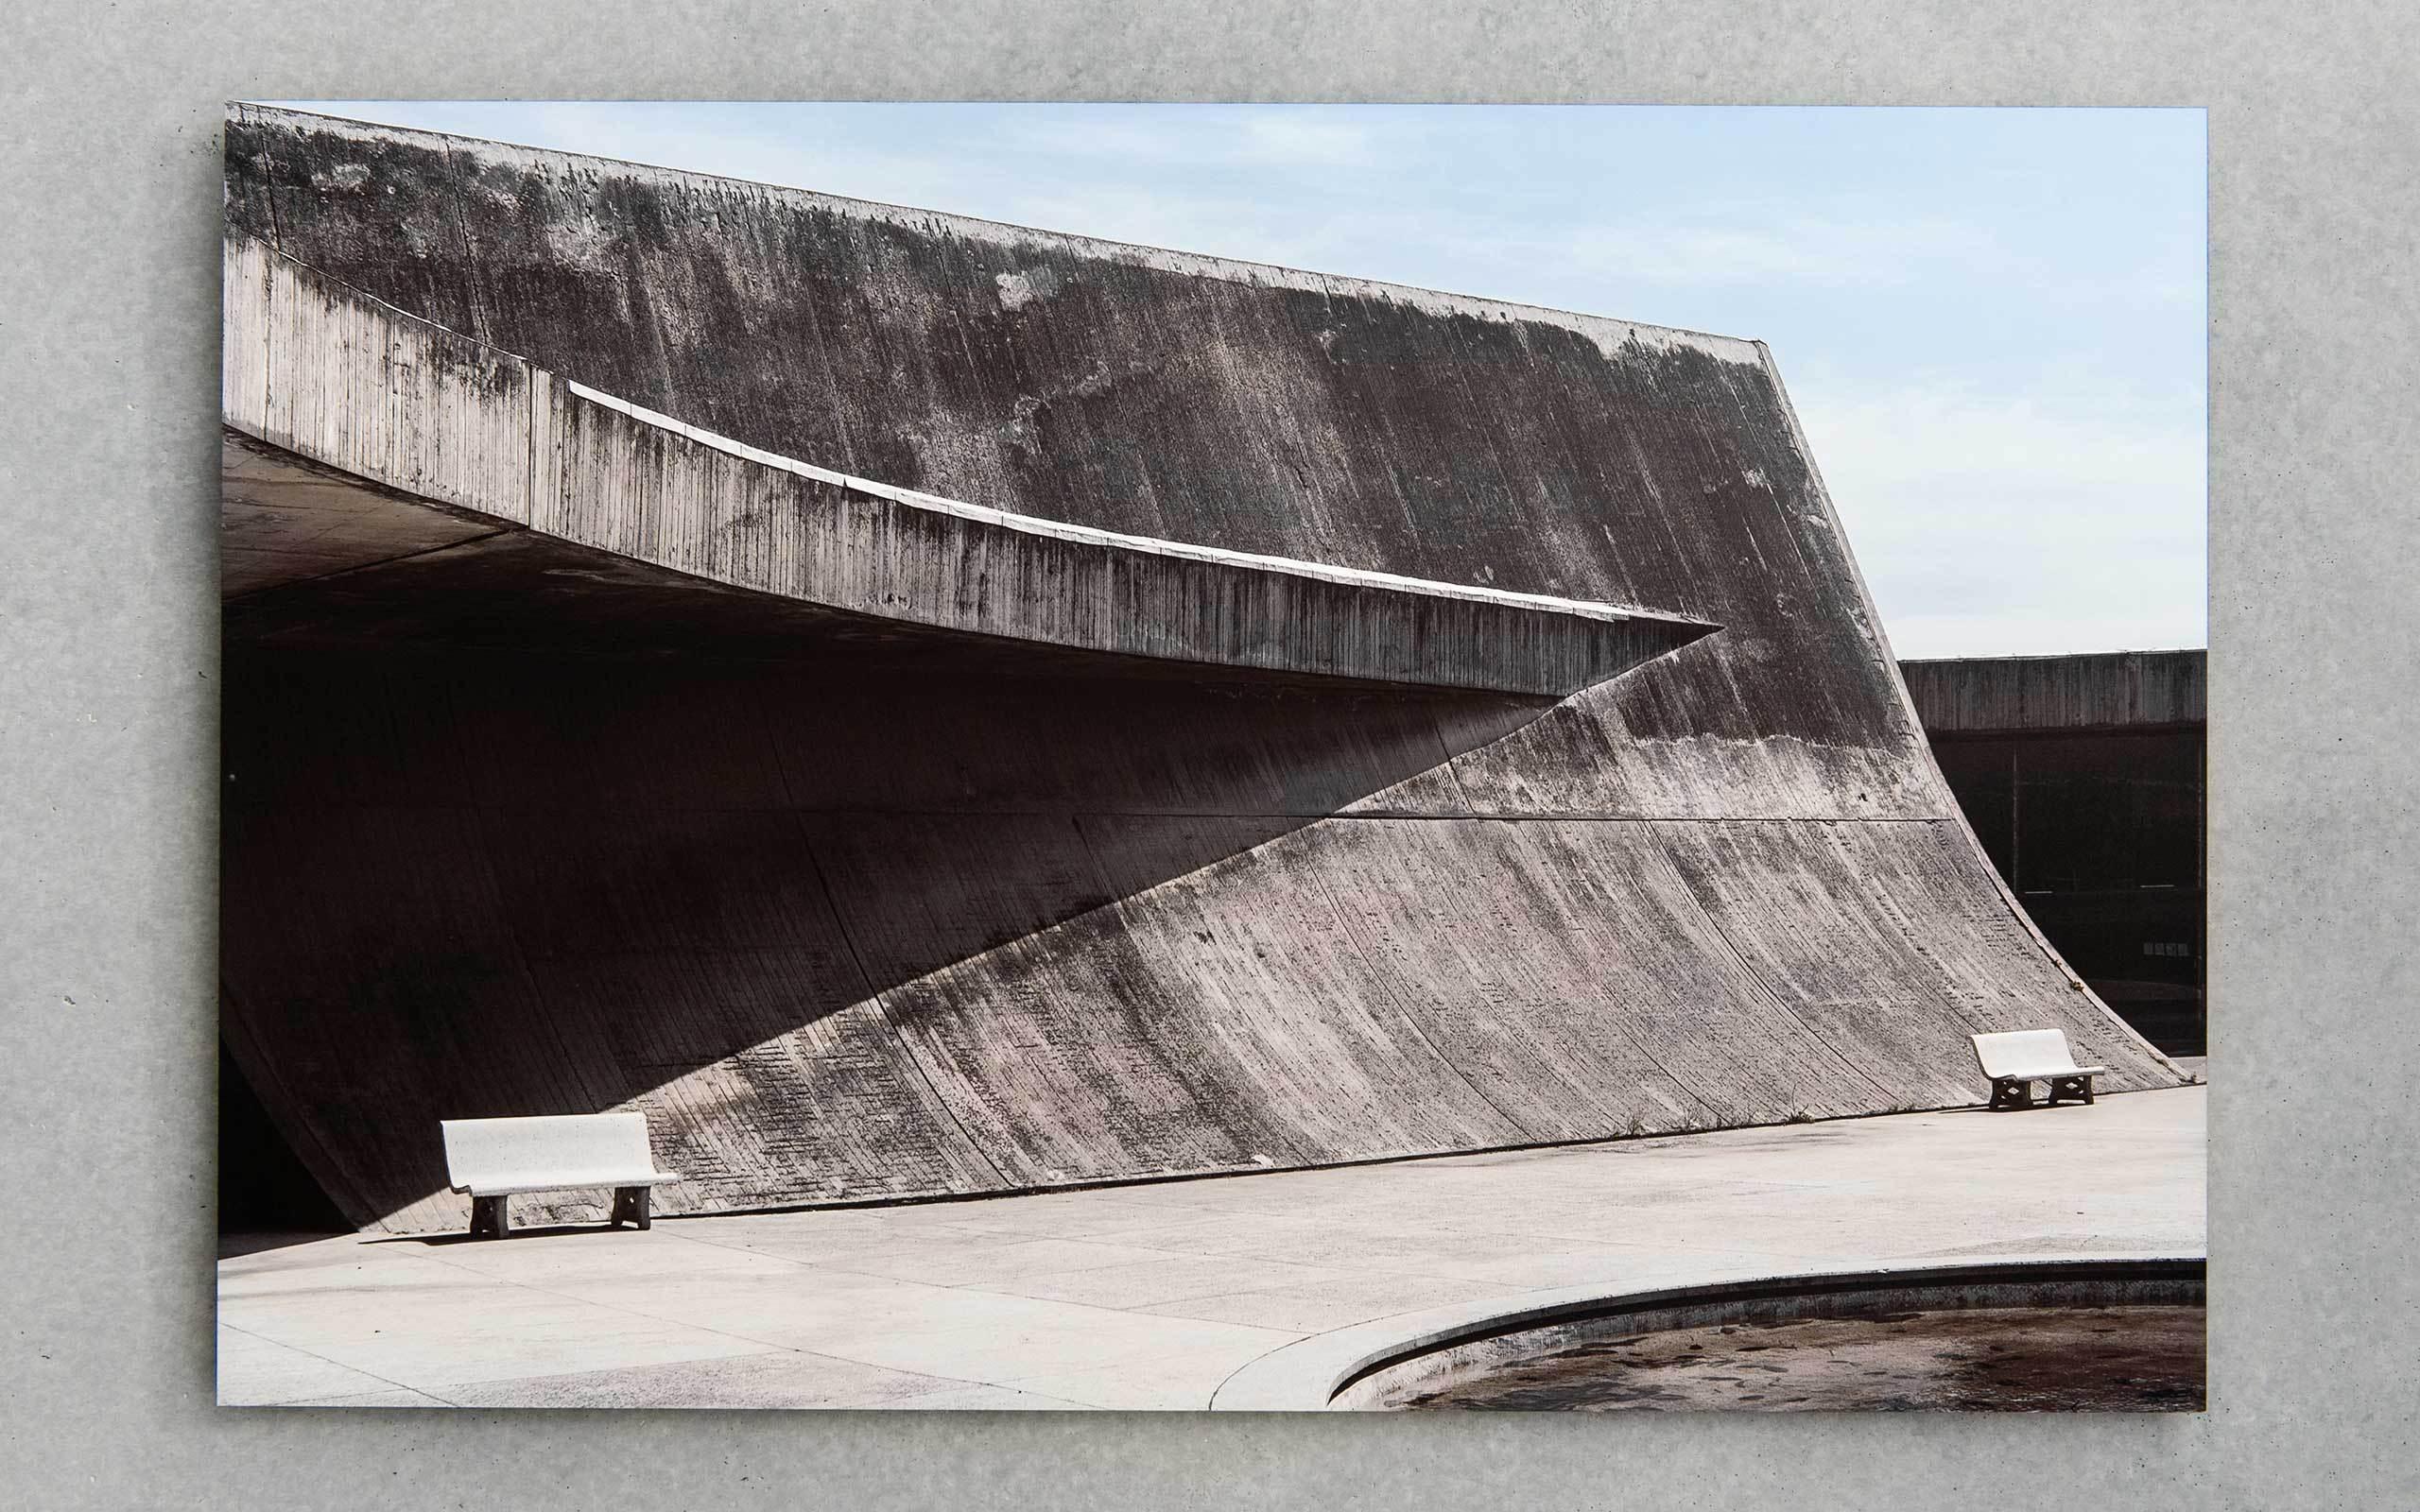 01 Arost Niemeyer